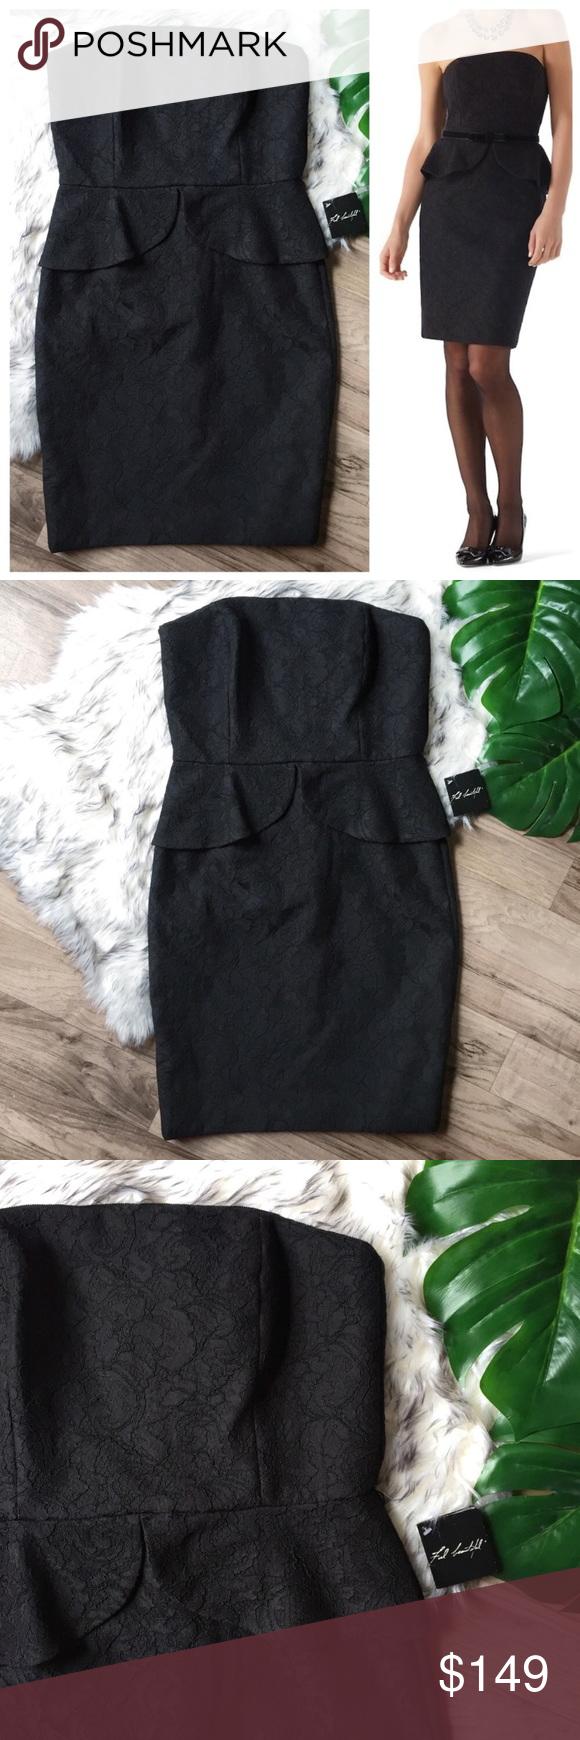 7b0edf83fe NWT WHBM black lace strapless peplum pencil dress NWT White House Black  Market midi dress.